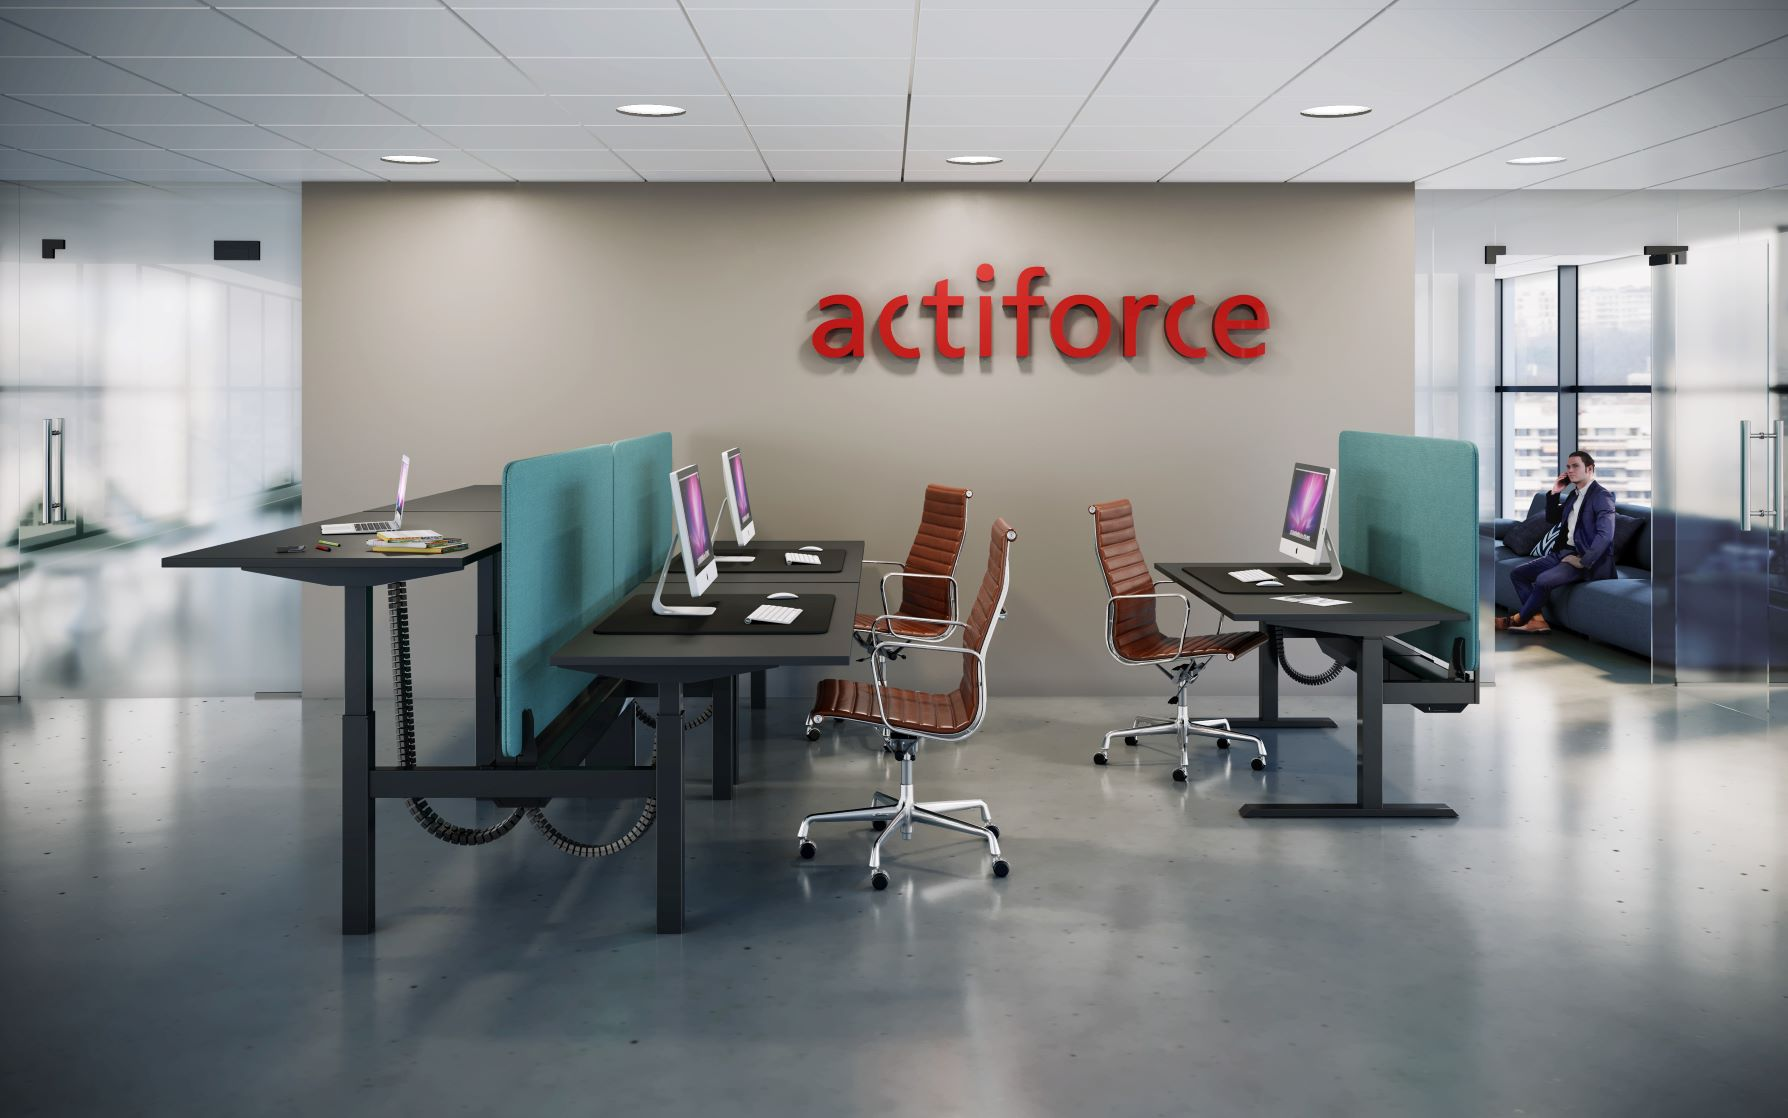 Image : Actiforce